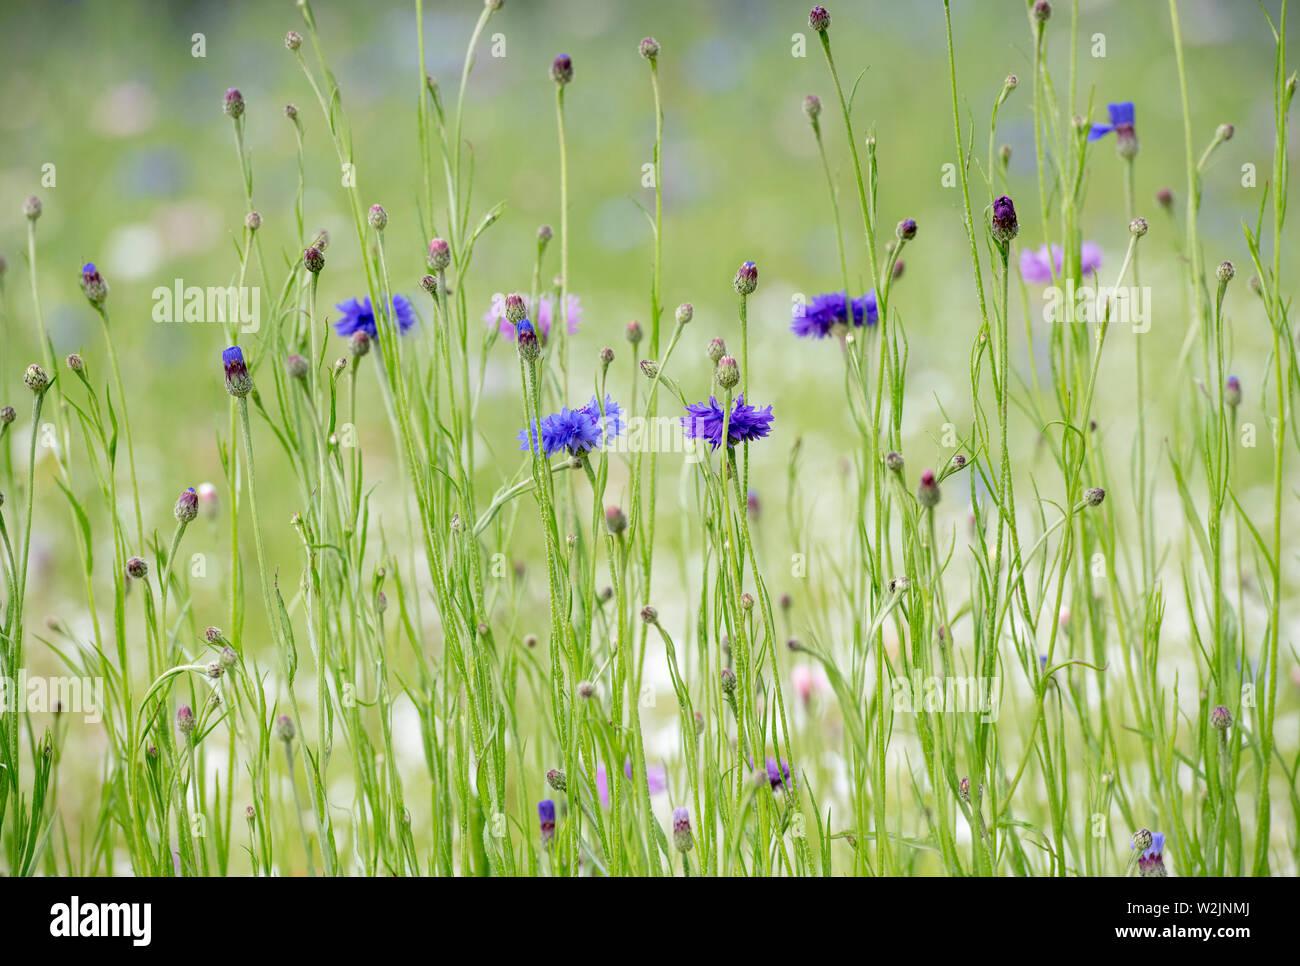 Centaurea cyanus. Cornflower wildflower meadow in an english garden - Stock Image